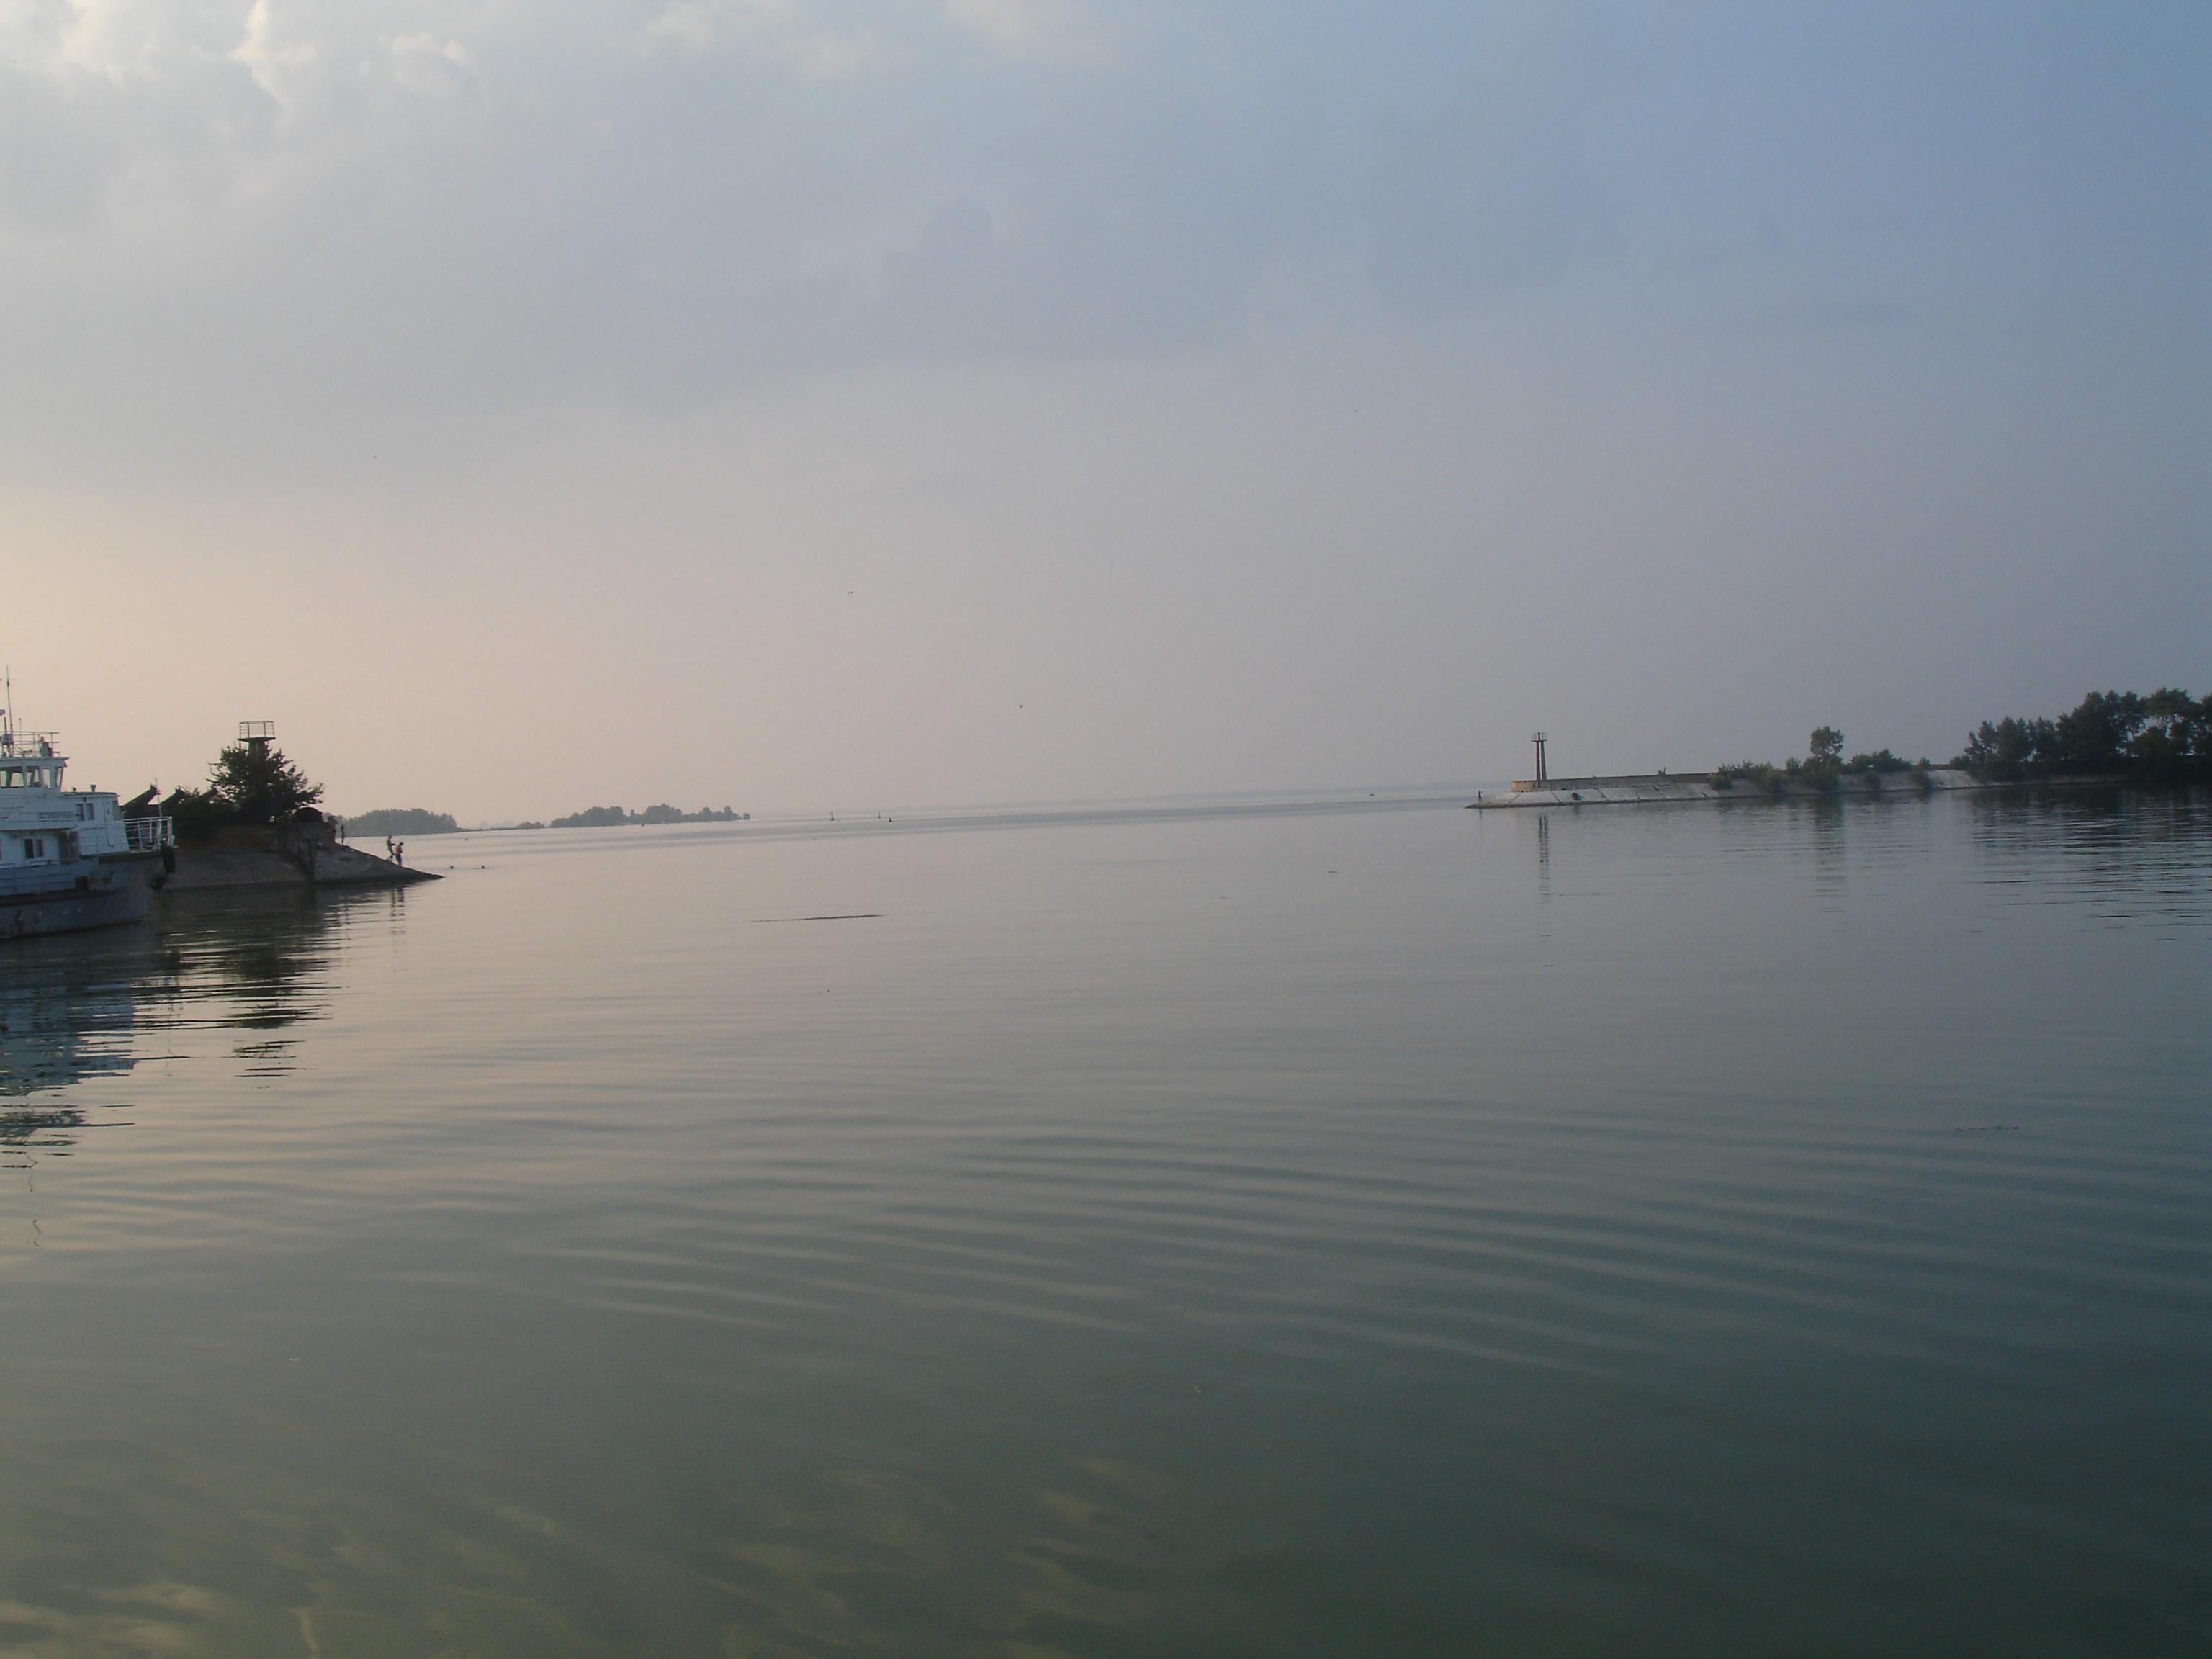 Узбережна частина Кременчуцького водосховища-моря